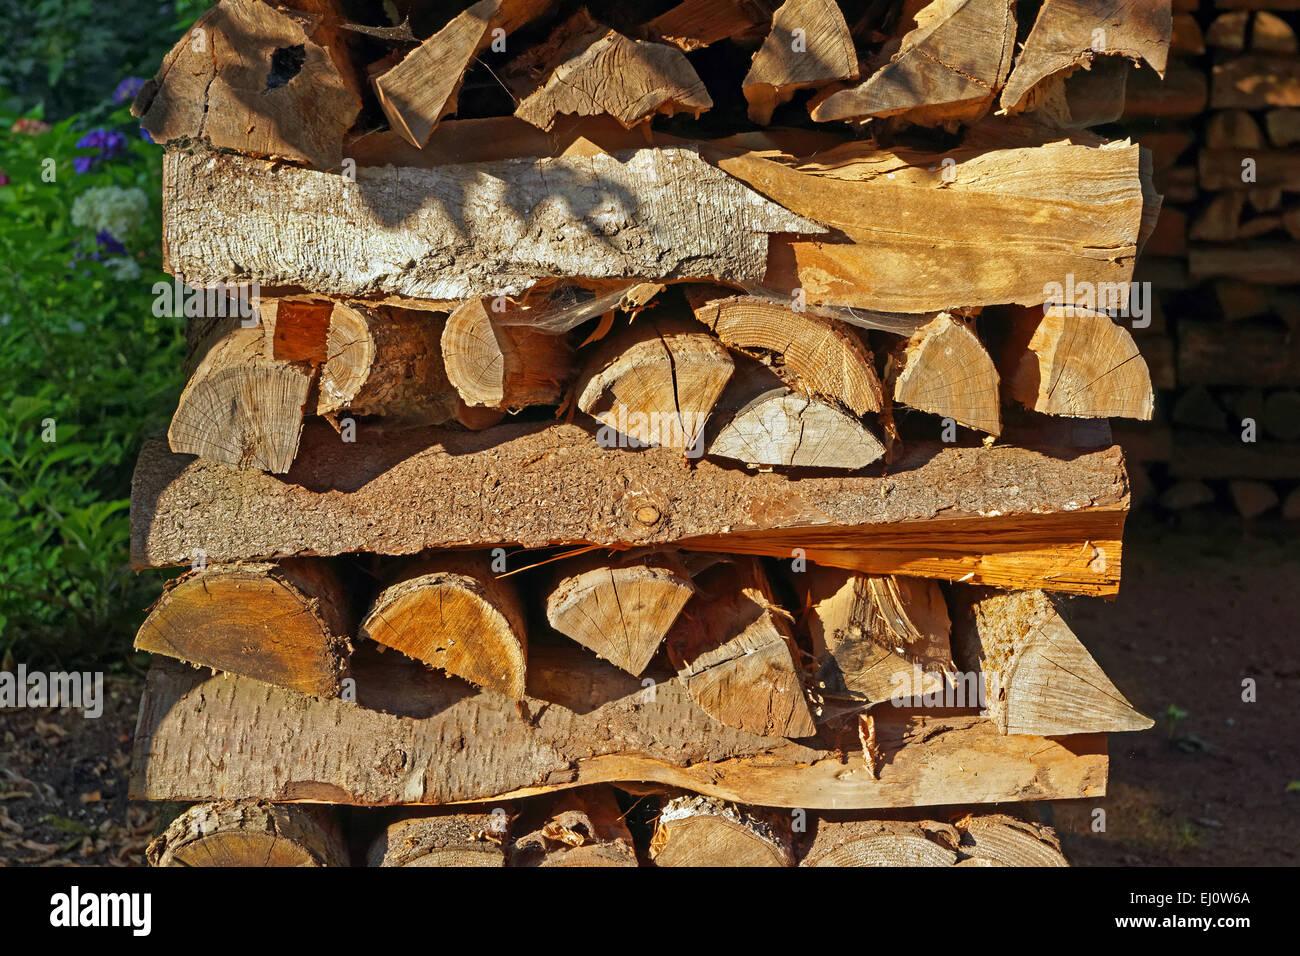 Europe, Germany, Europe, Rhineland-Palatinate, Erlenbach bei Dahn, castle, Berwartstein, wooden pile, detail, mood, Stock Photo